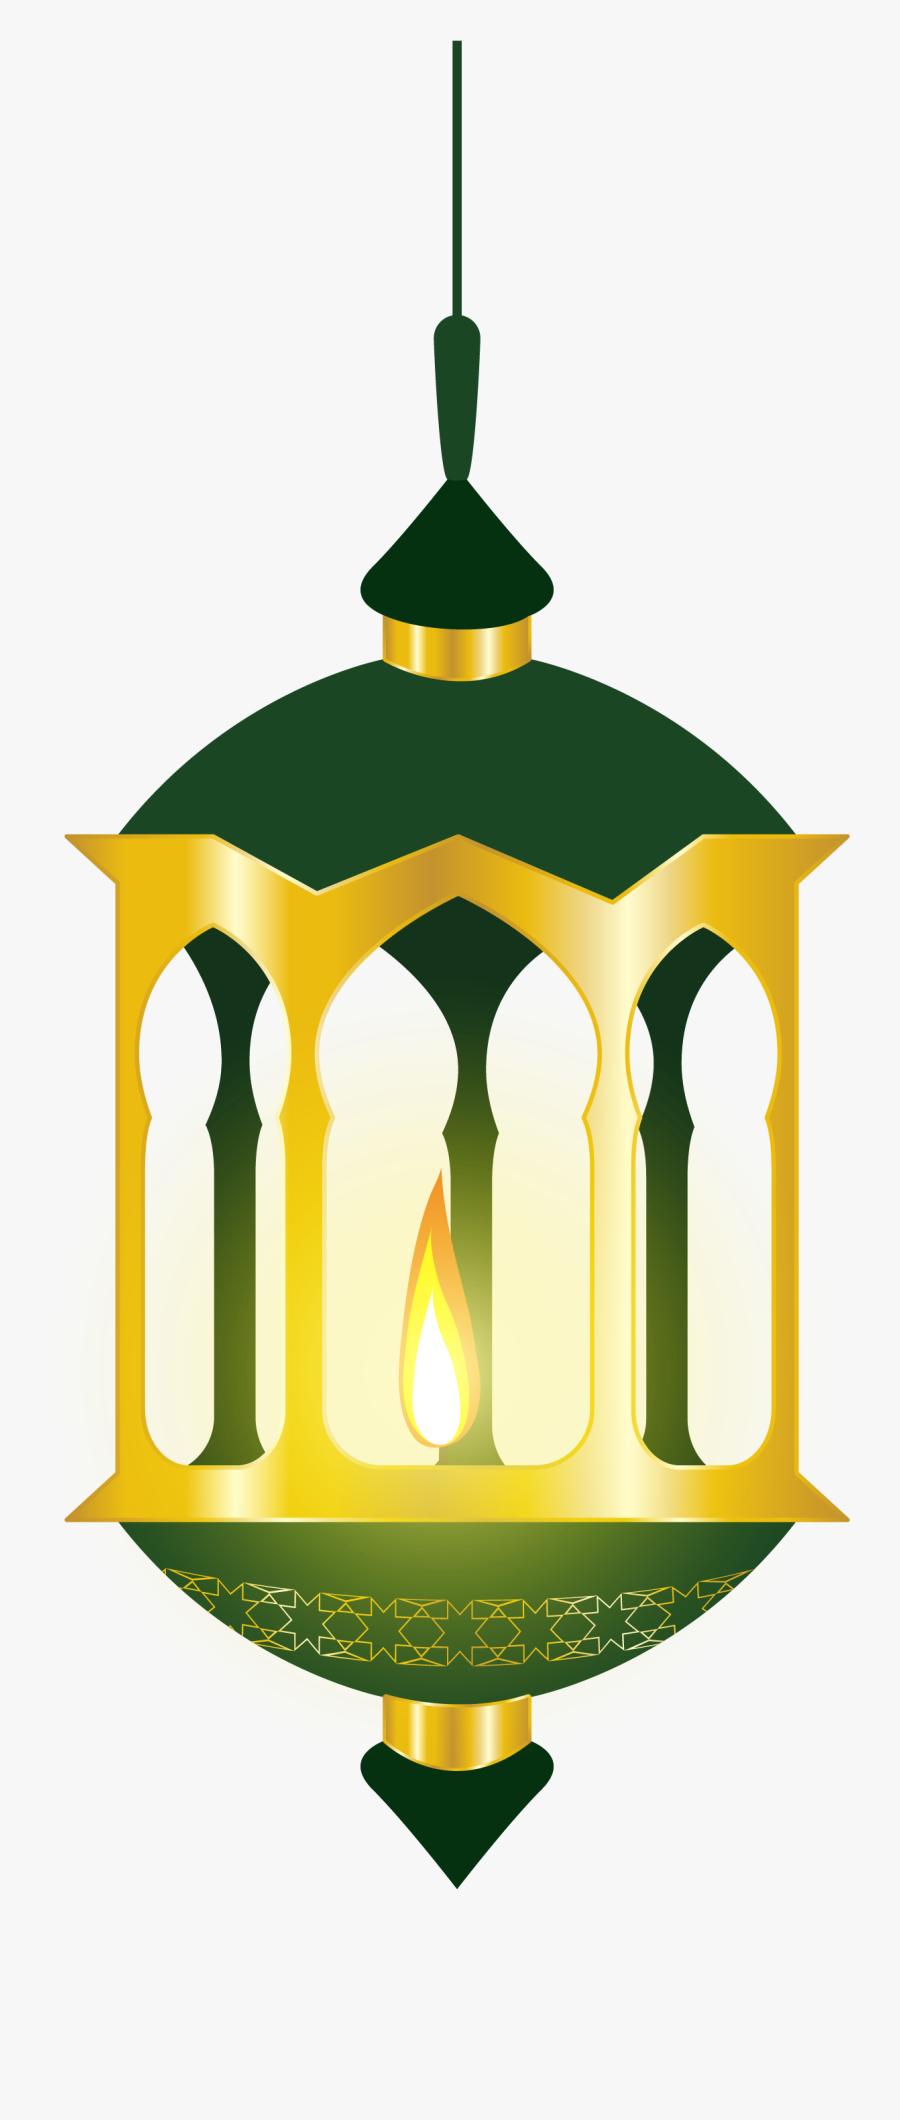 Oil Light Fixture Lamp Chandelier Lighting Eid Clipart - Eid Ul Fitr 2019 Png, Transparent Clipart